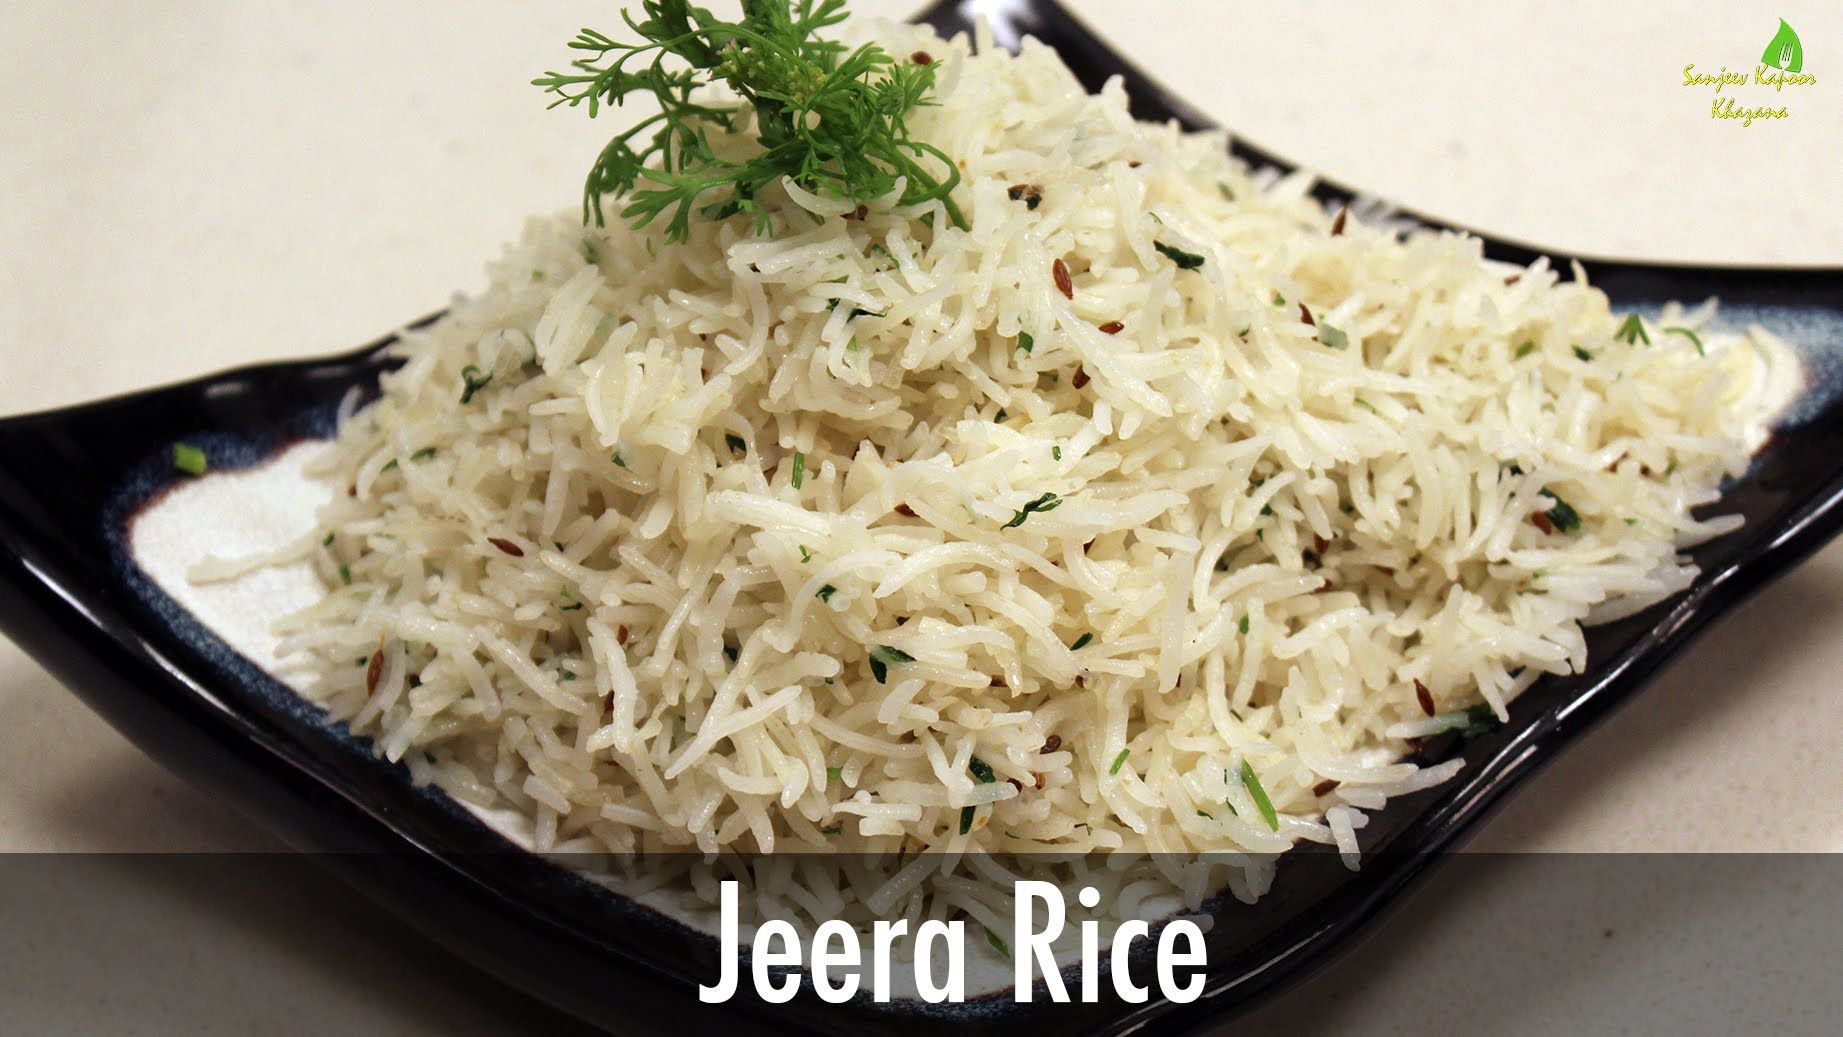 Jeera rice sanjeev kapoor khazana yumm ix pinterest food jeera rice sanjeev kapoor khazana forumfinder Choice Image